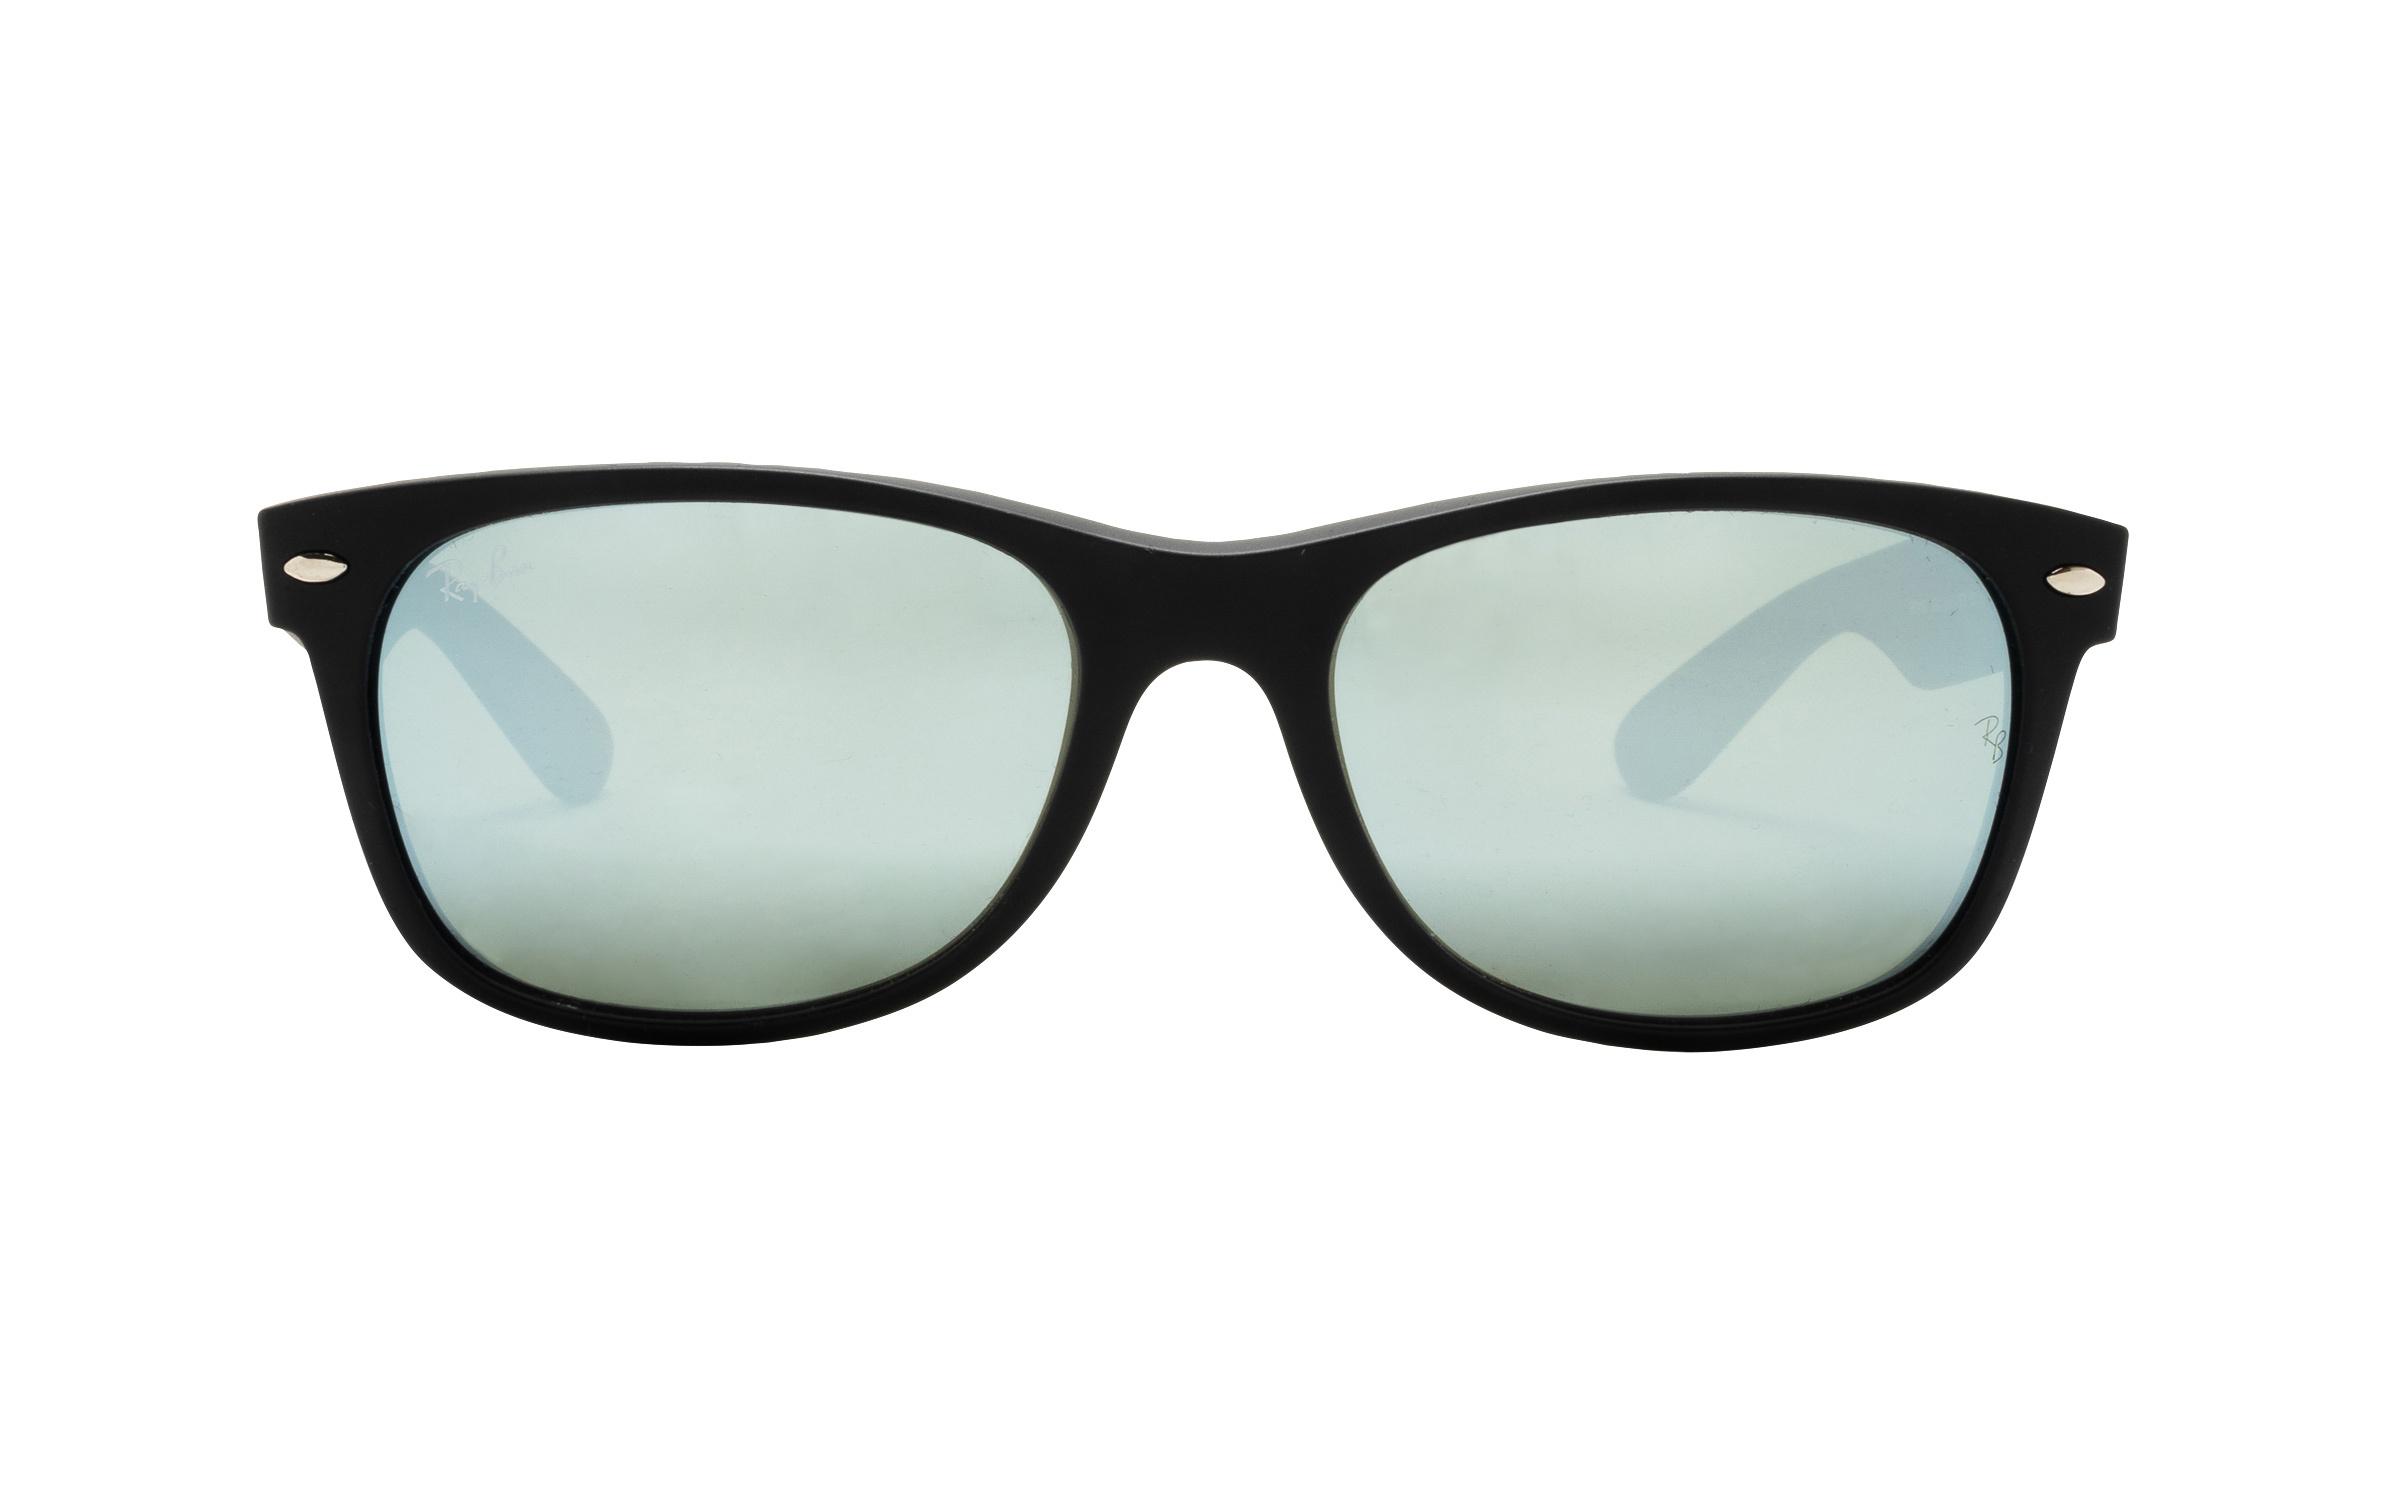 coastal.com - RayBan Ray-Ban RB2132 622/30 55 Sunglasses in Rubber Black – Online Coastal 169.00 USD